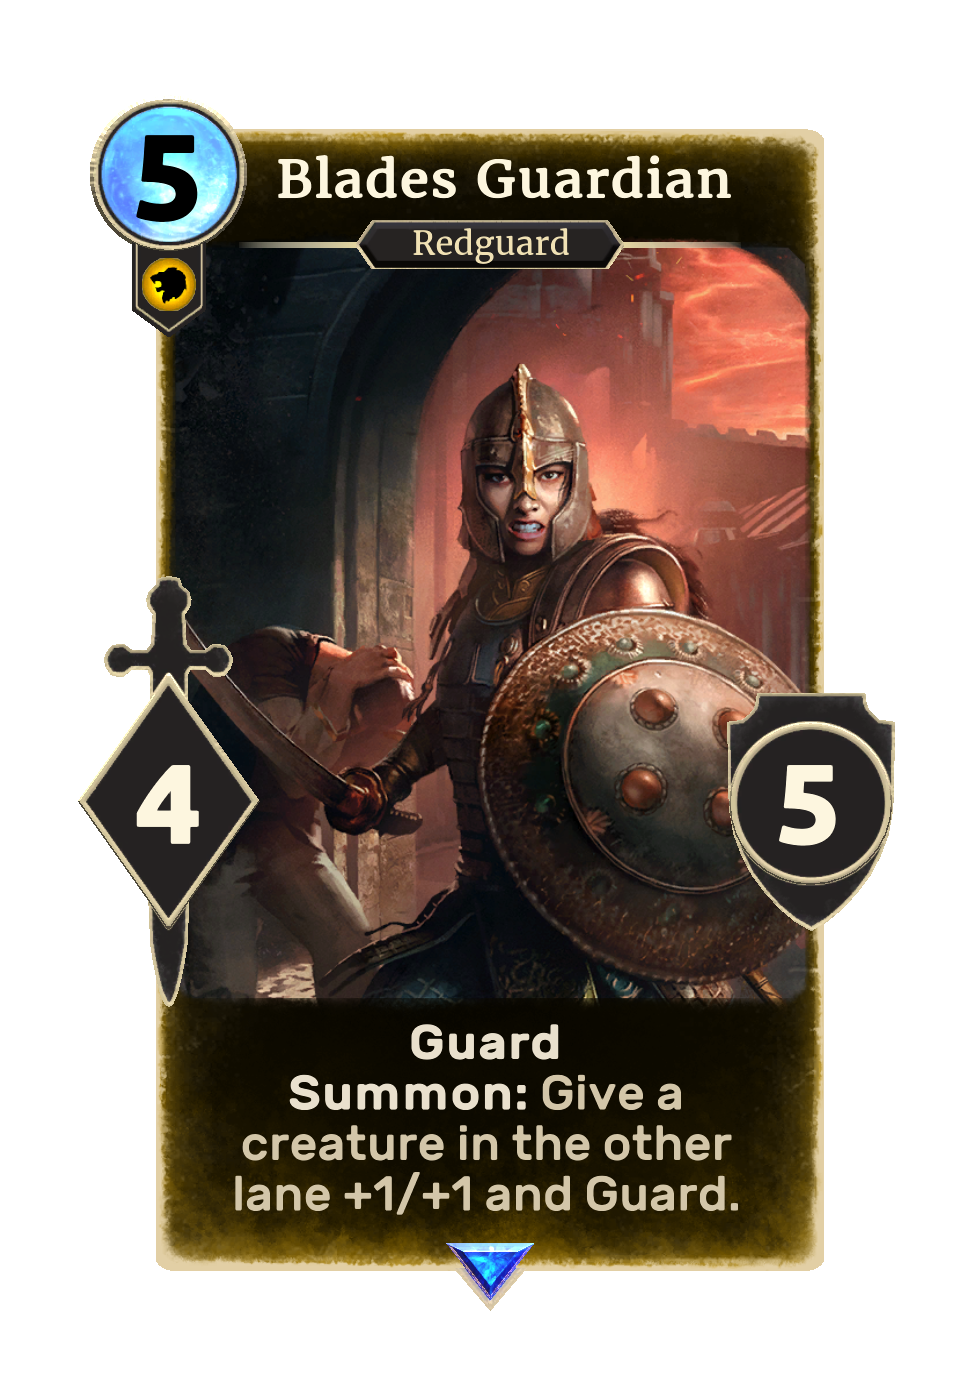 Blades Guardian